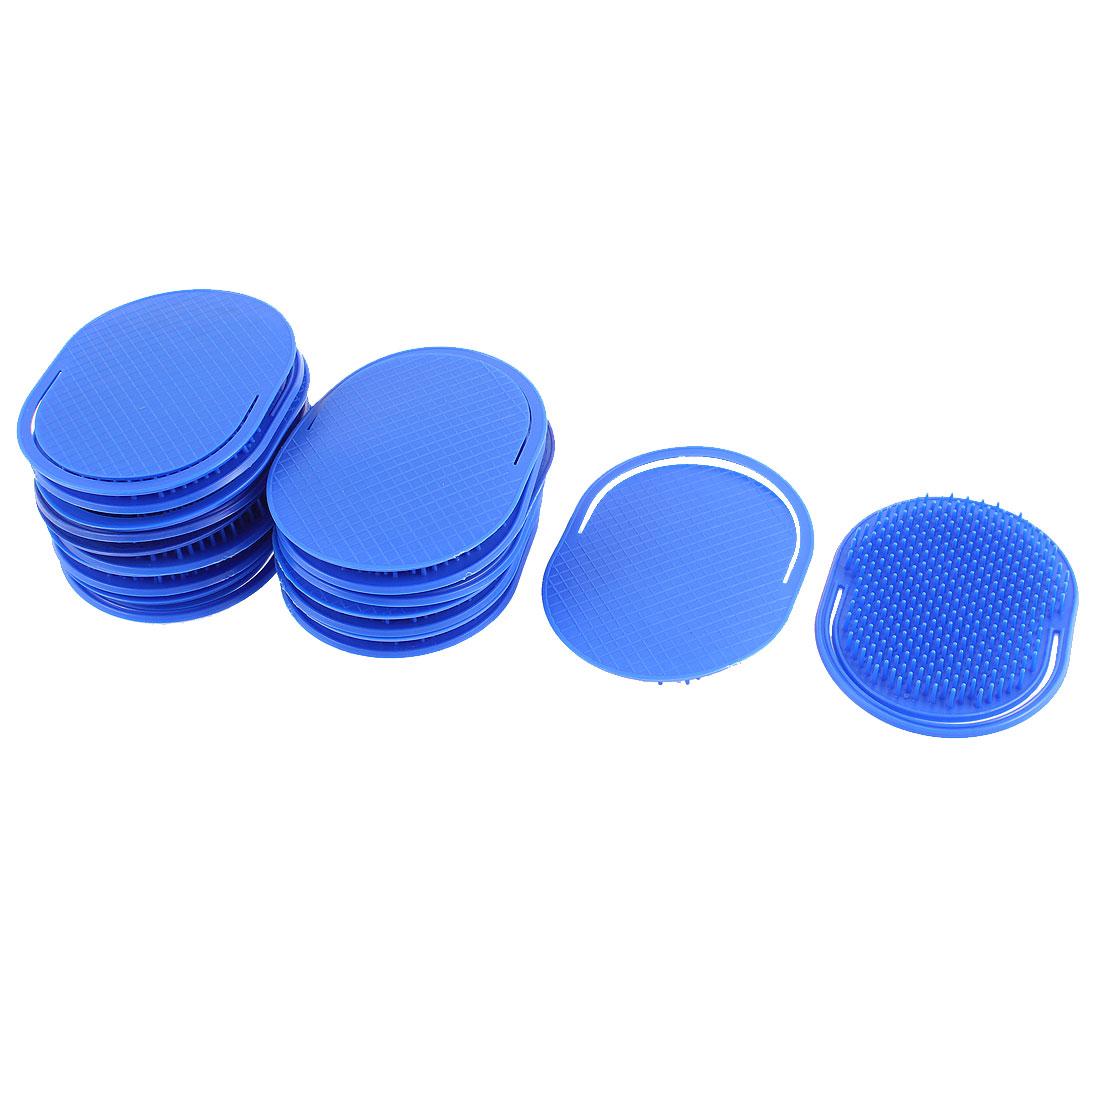 Travel Hair Comb Scalp Massage Brush Dark Blue 20Pcs